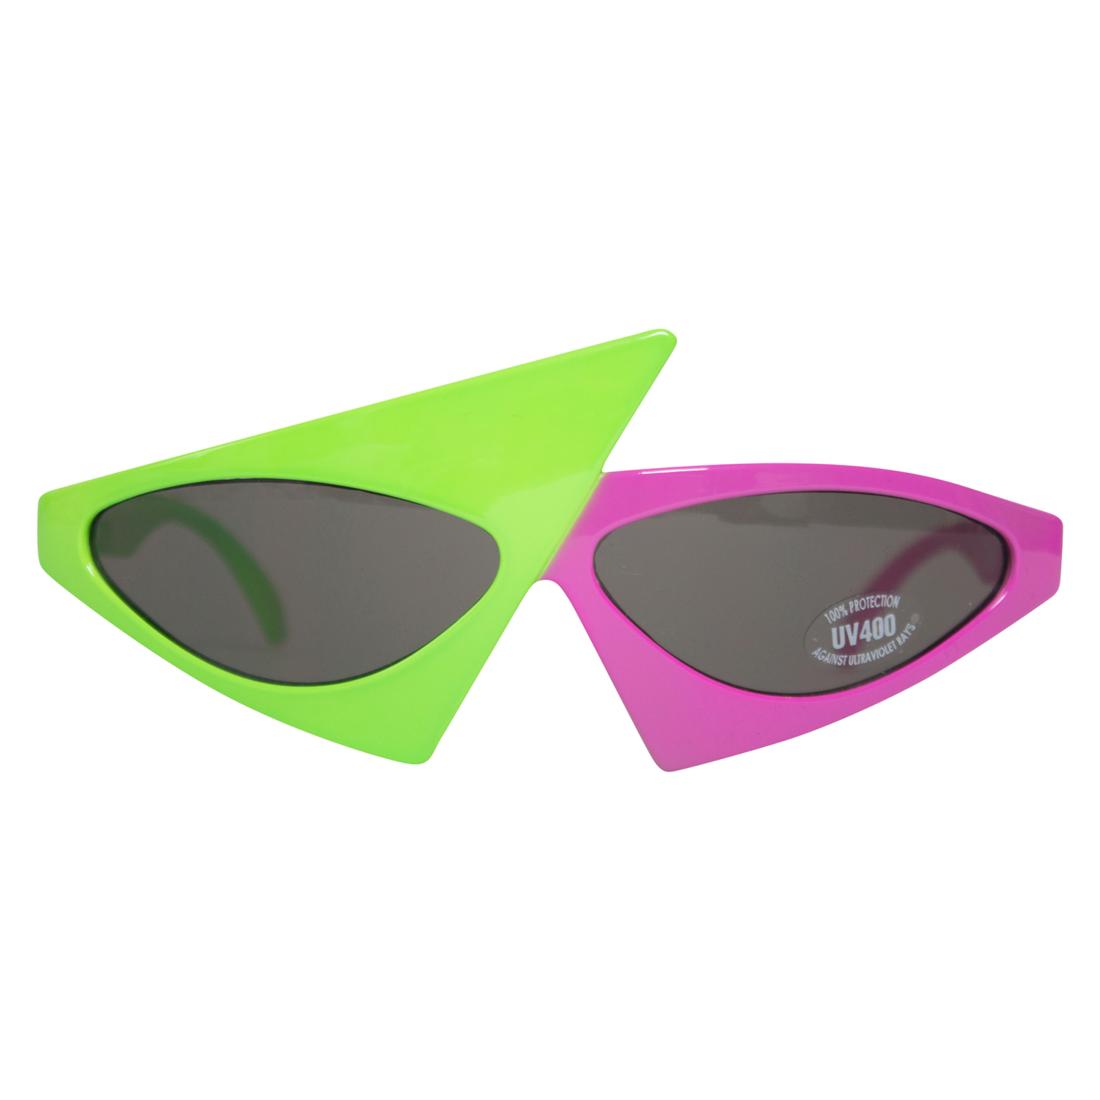 249279fd55 Roy Purdys Glasses – The Prolific Shop